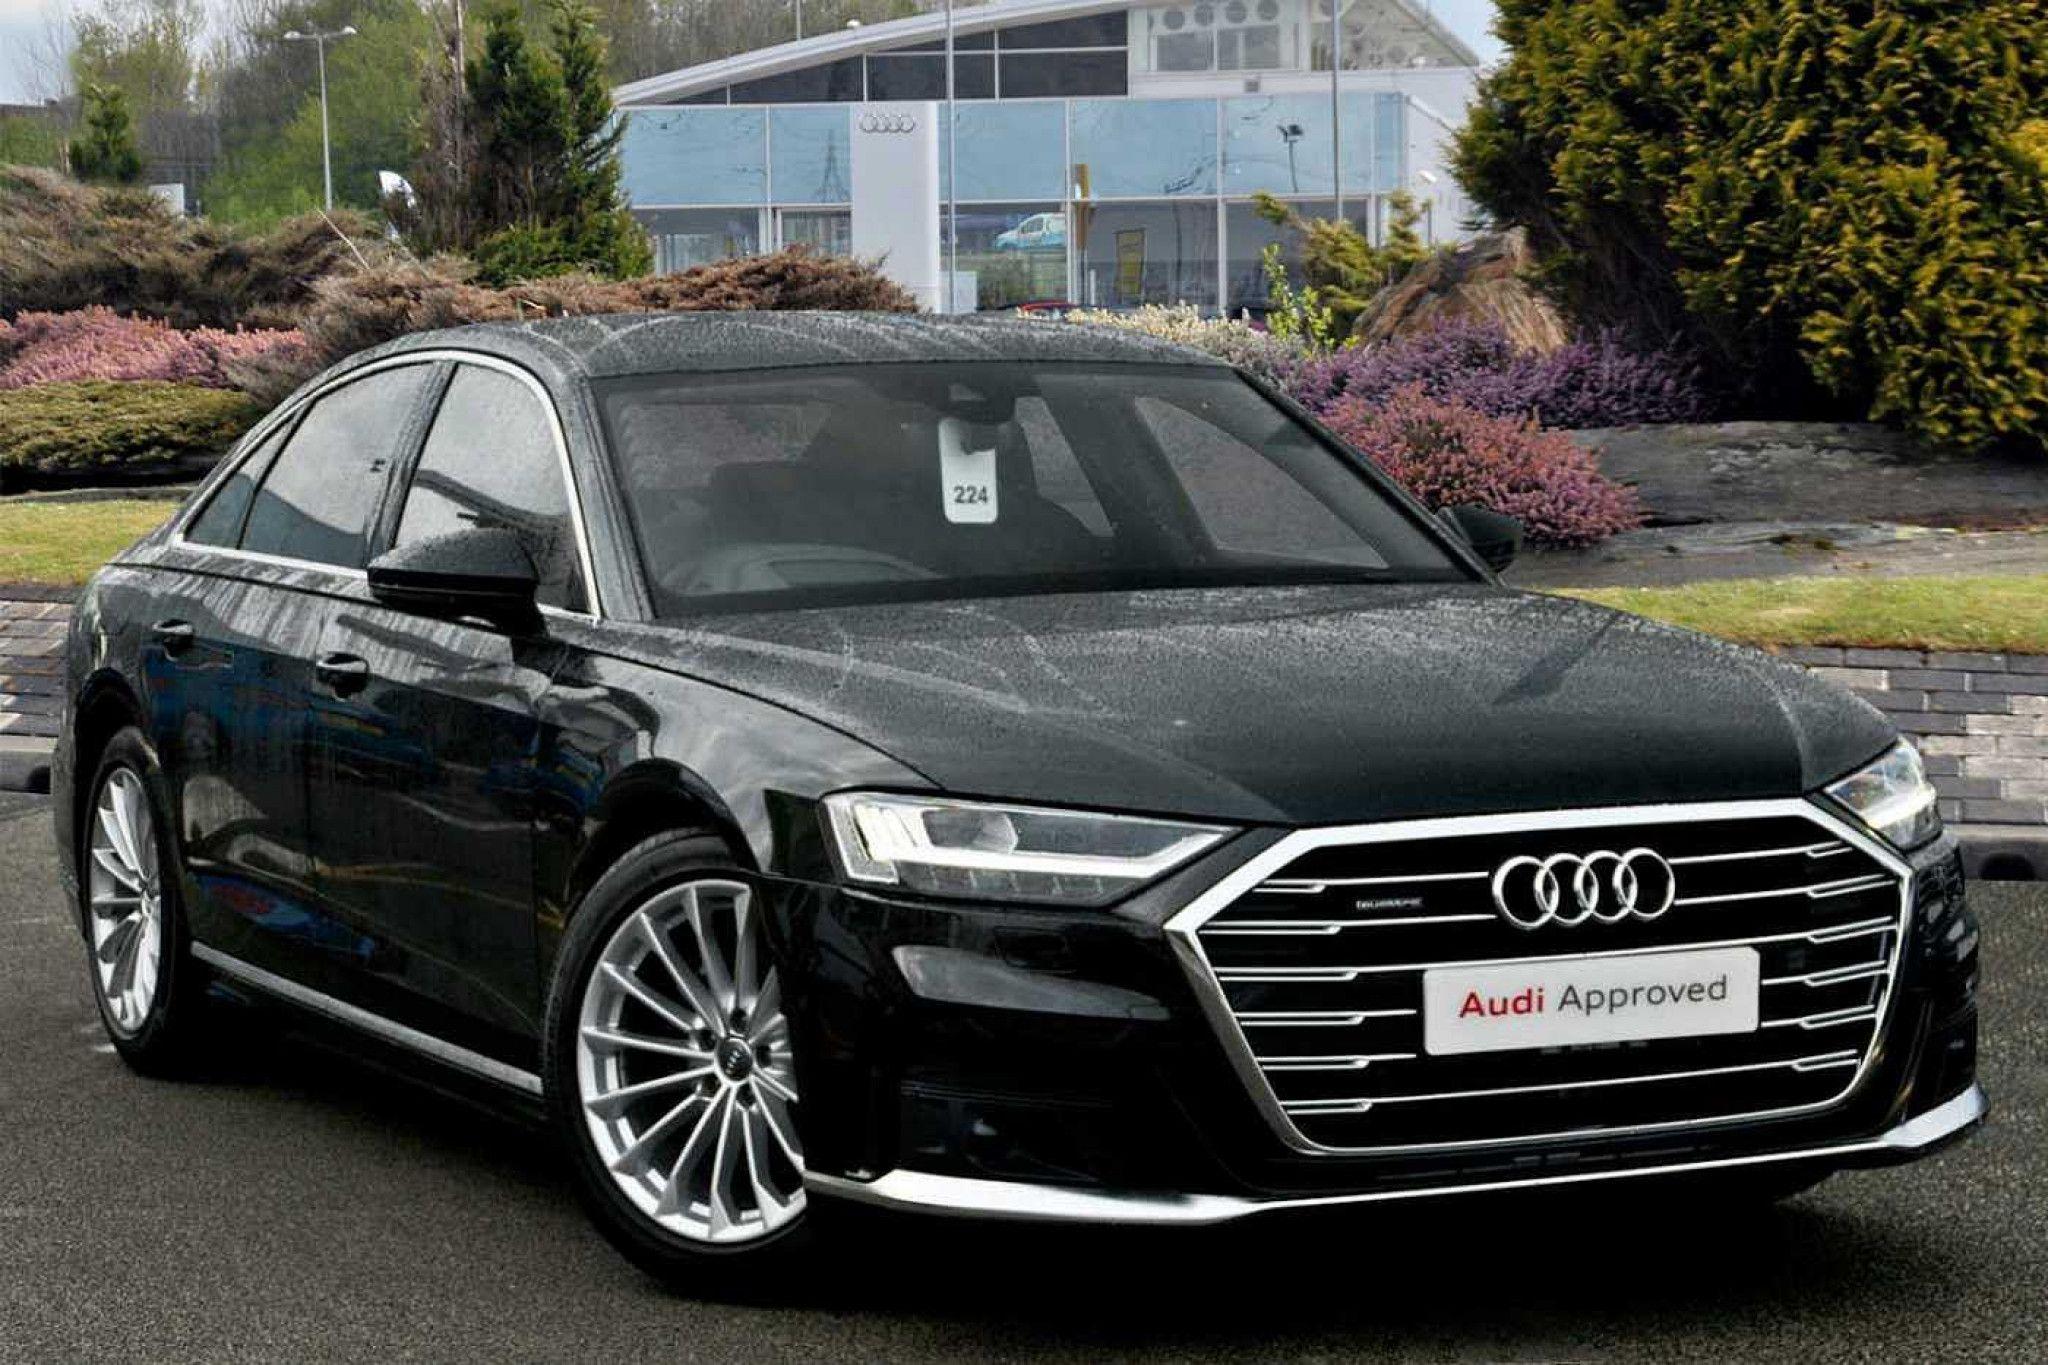 Audi A8 50 Tdi Quattro S Line 4dr Tiptronic En 2020 Autos Exoticos Autos